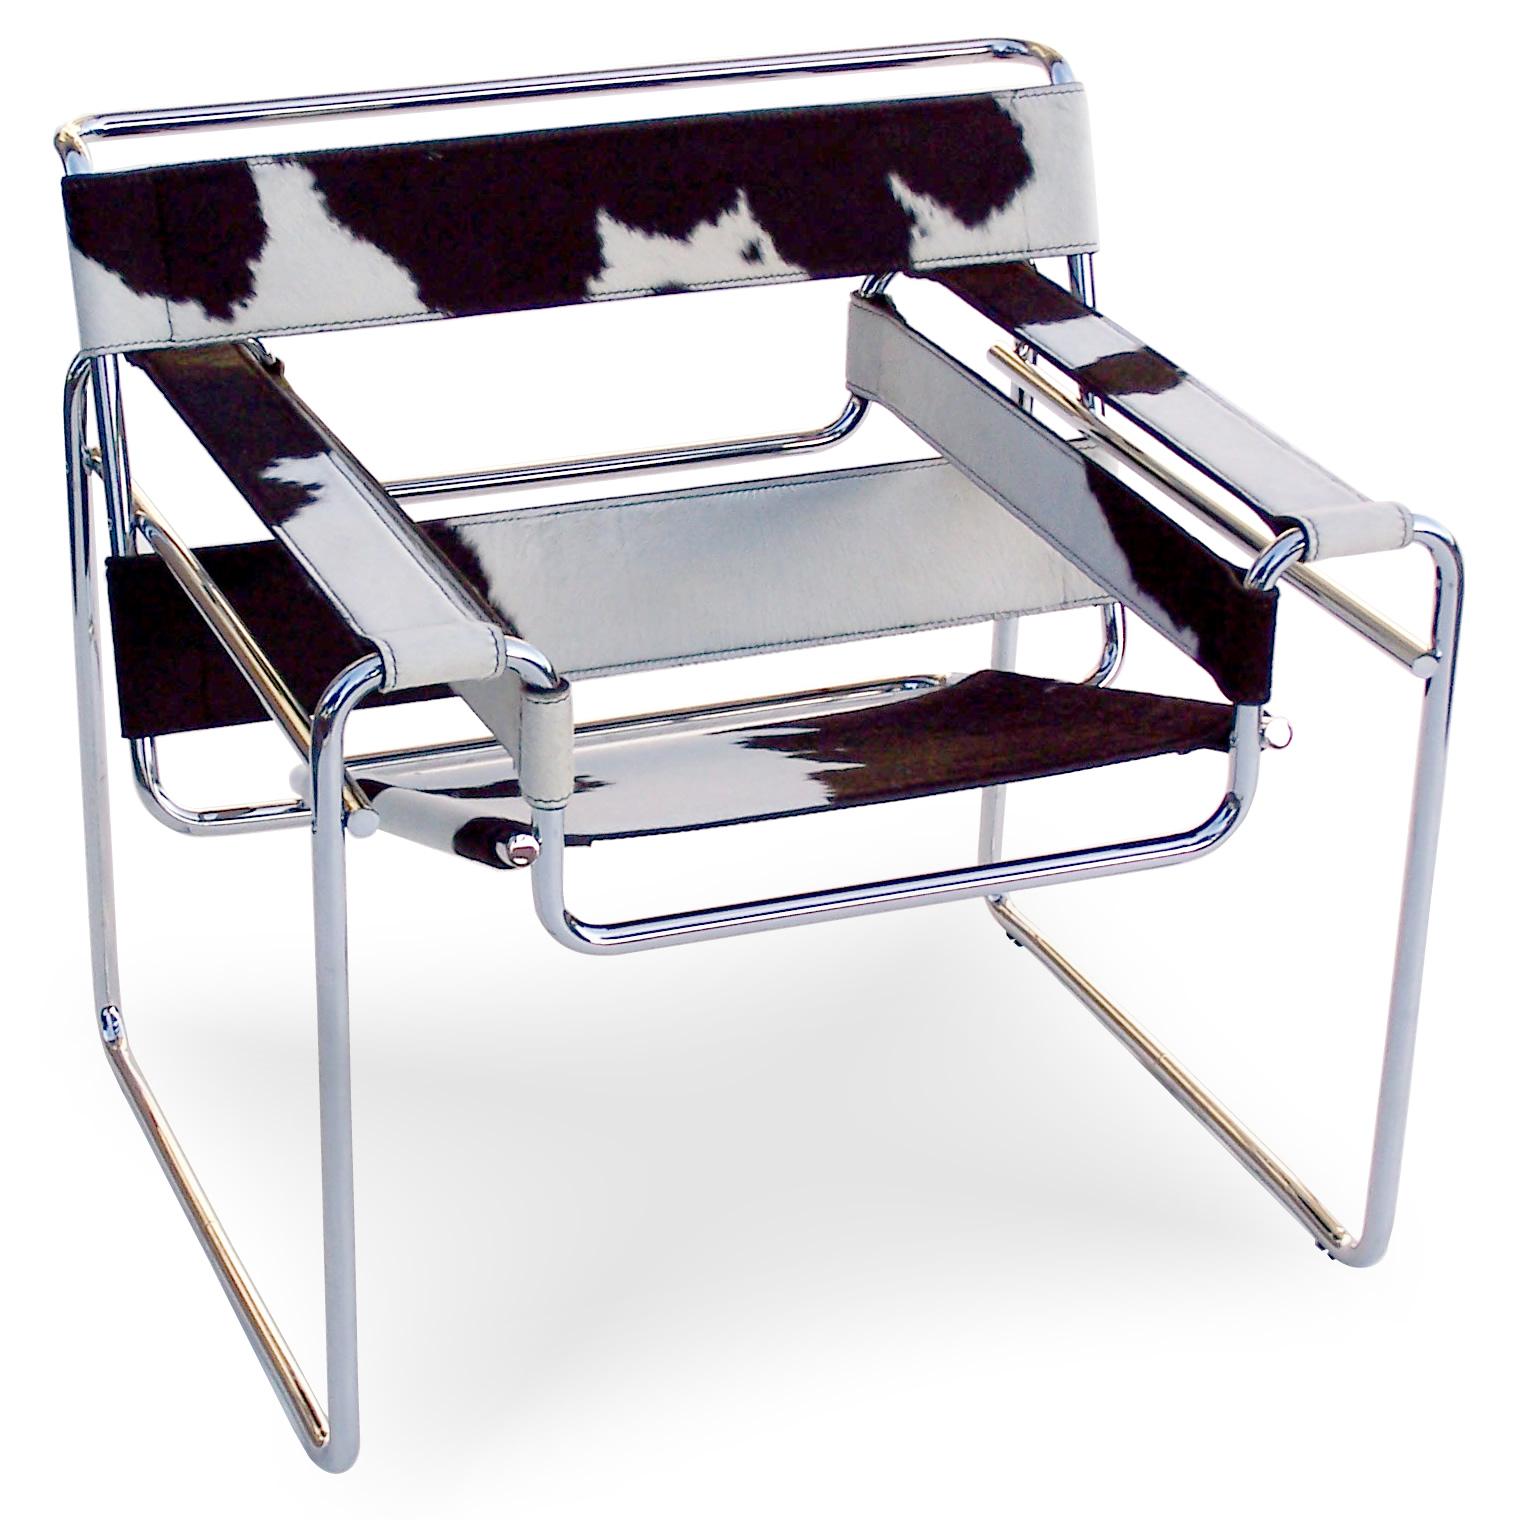 Poltrona wassily bauhaus furniture mobili bauhaus for Sedia design usata